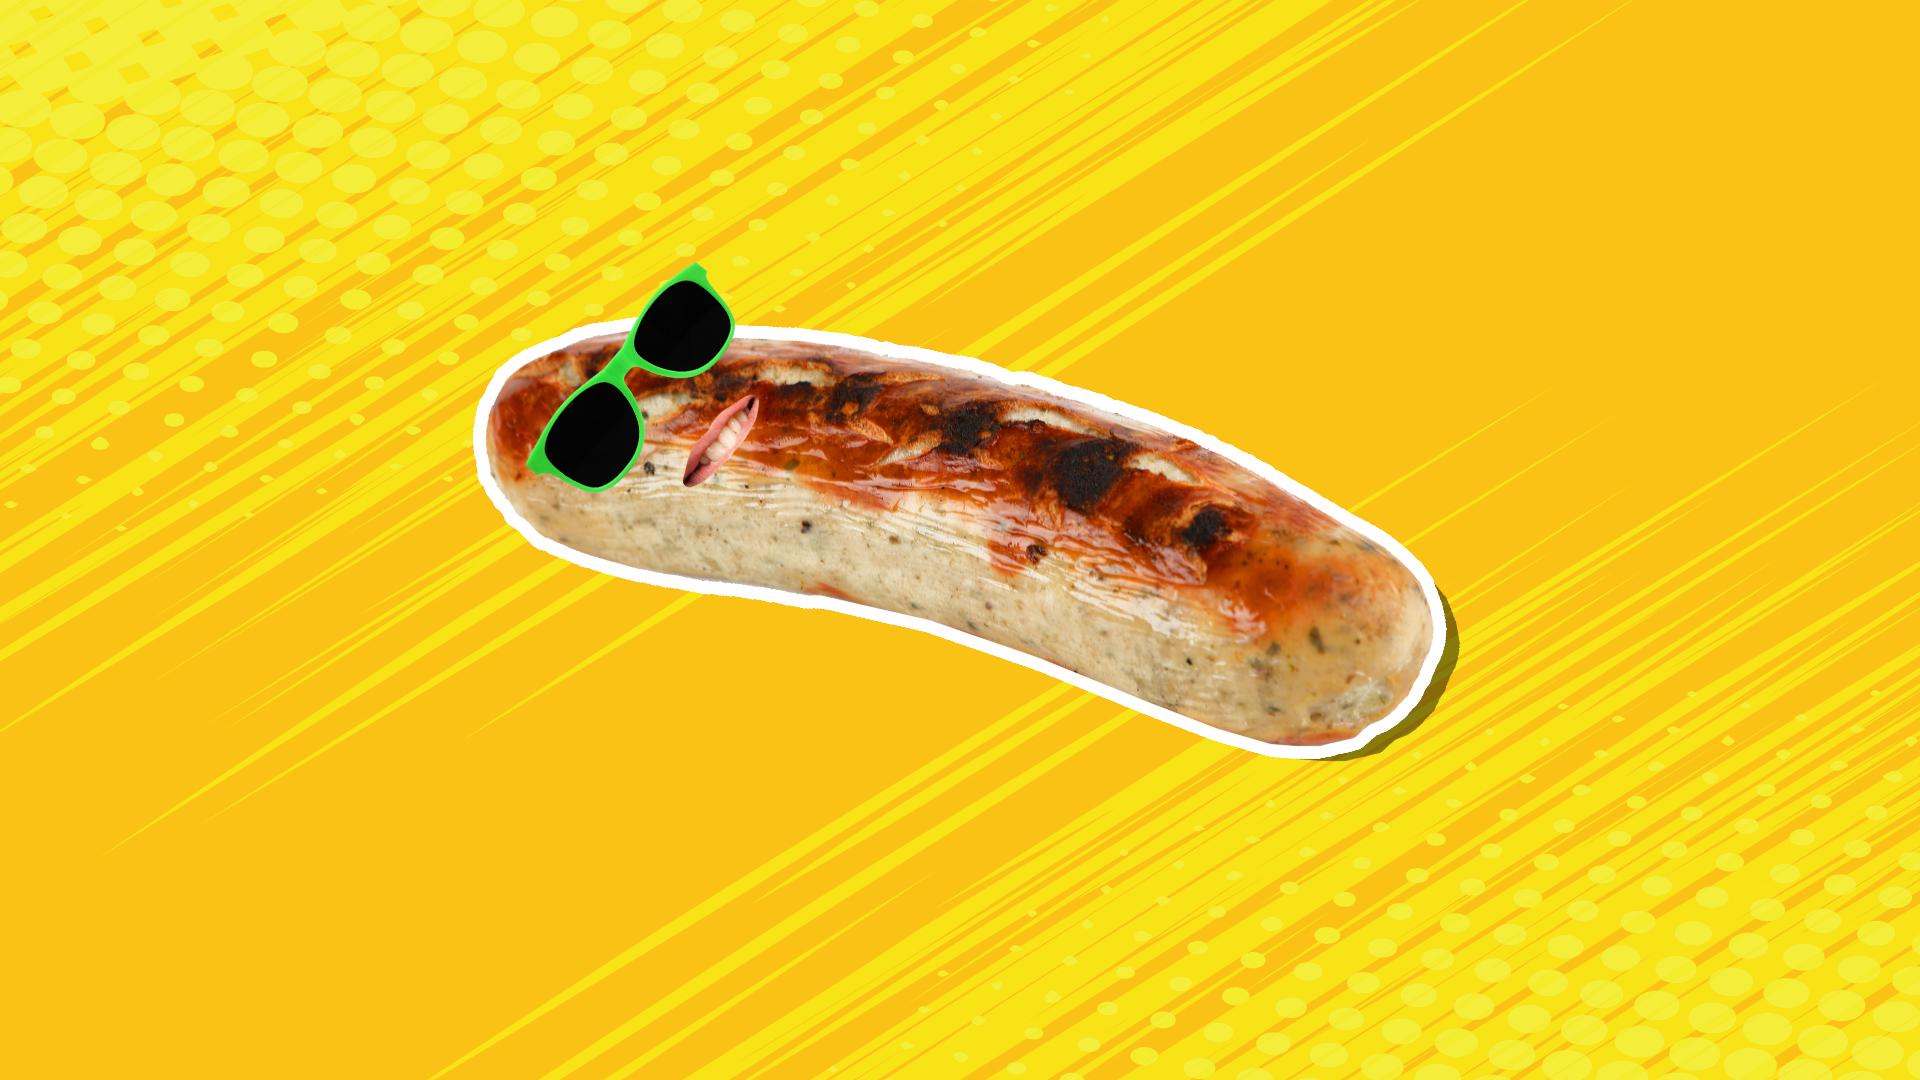 A sunbathing sausage